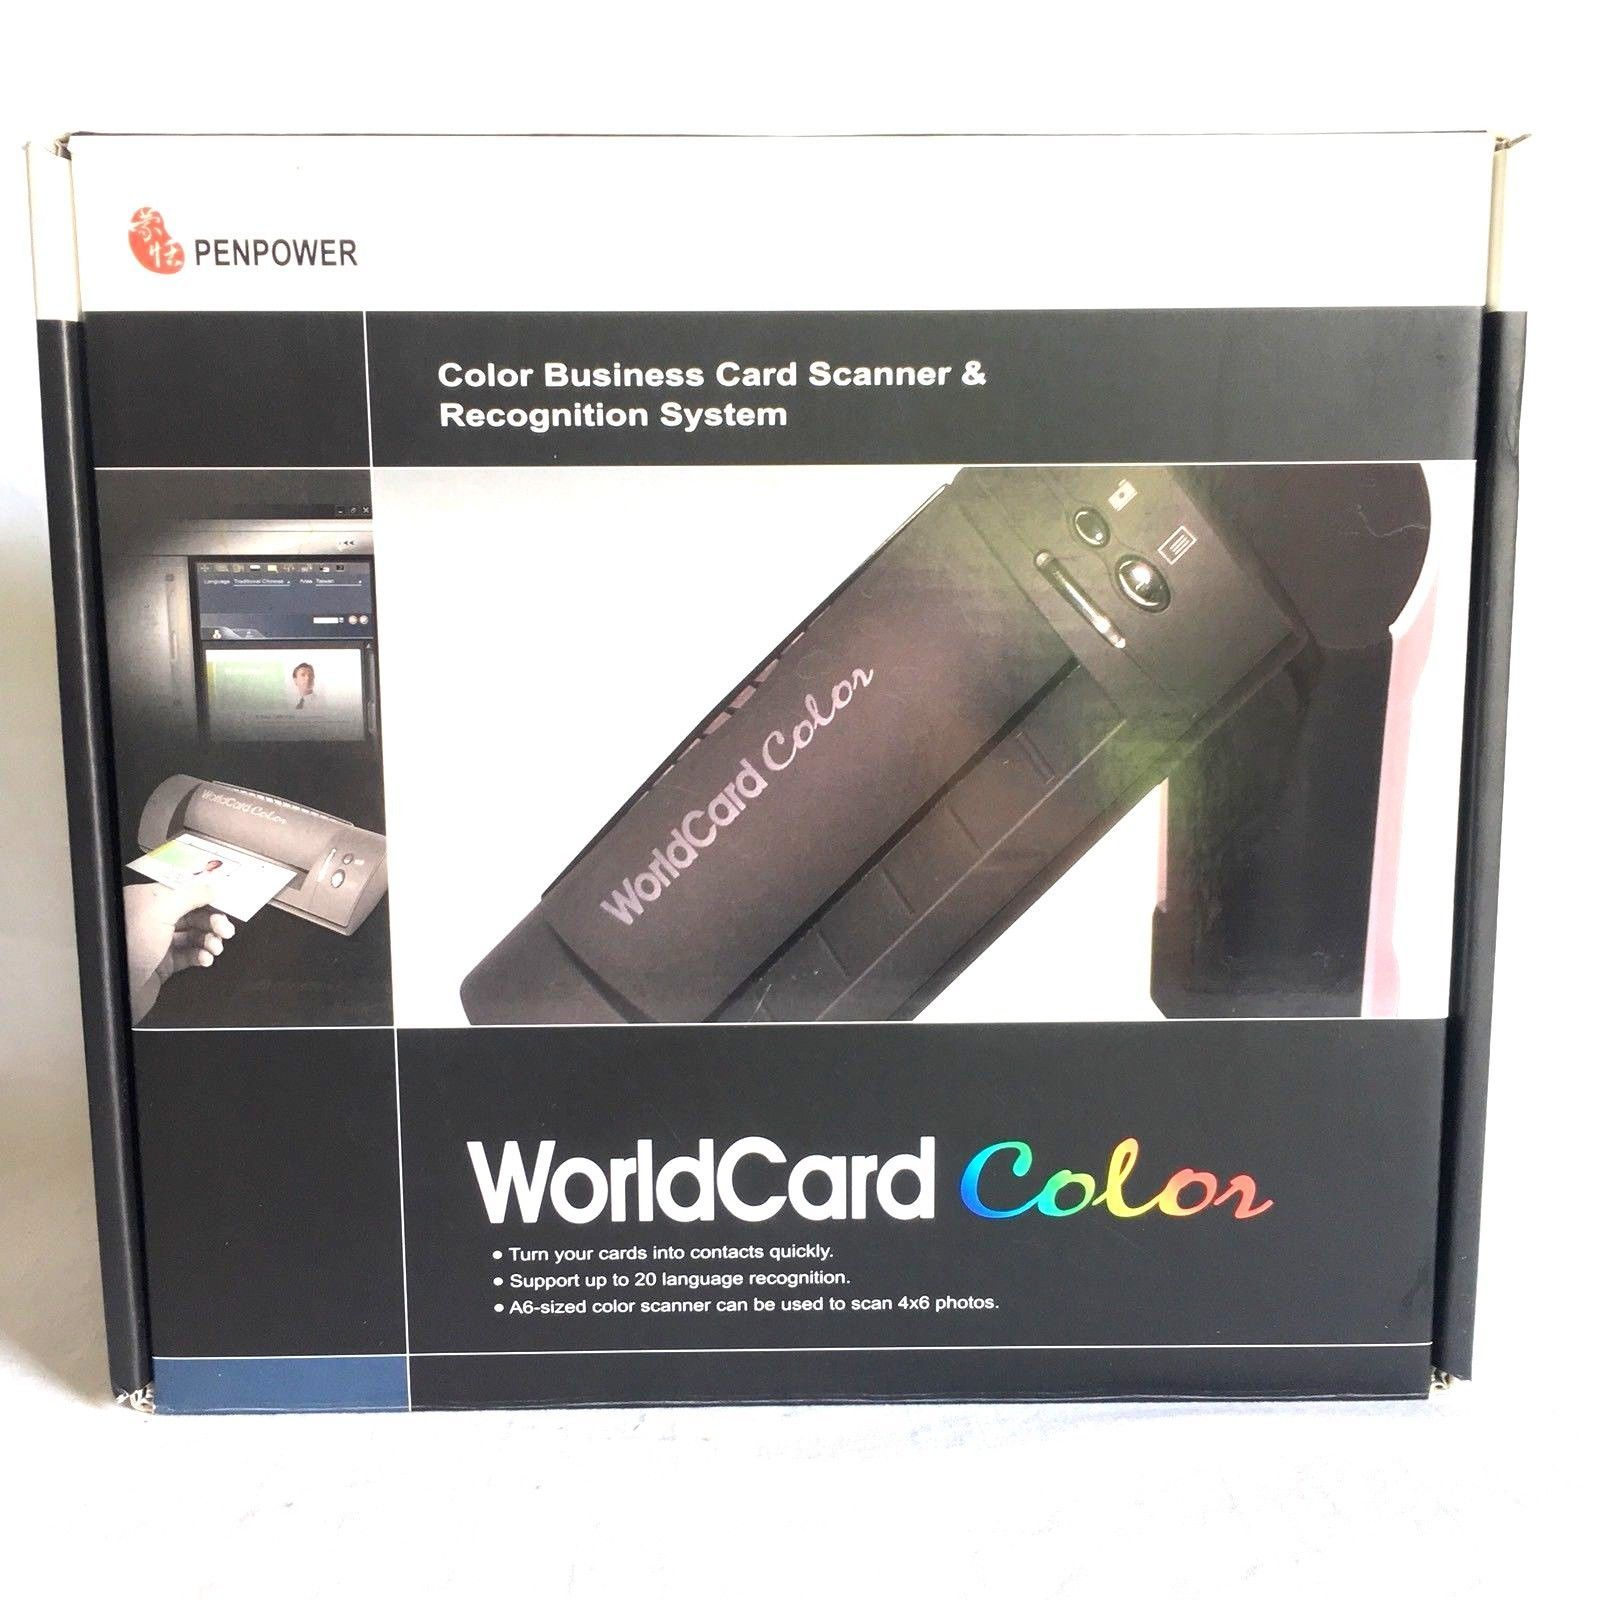 Penpower worldcard color document id business card picture scanner w penpower worldcard color document id business card picture scanner wsoftware colourmoves